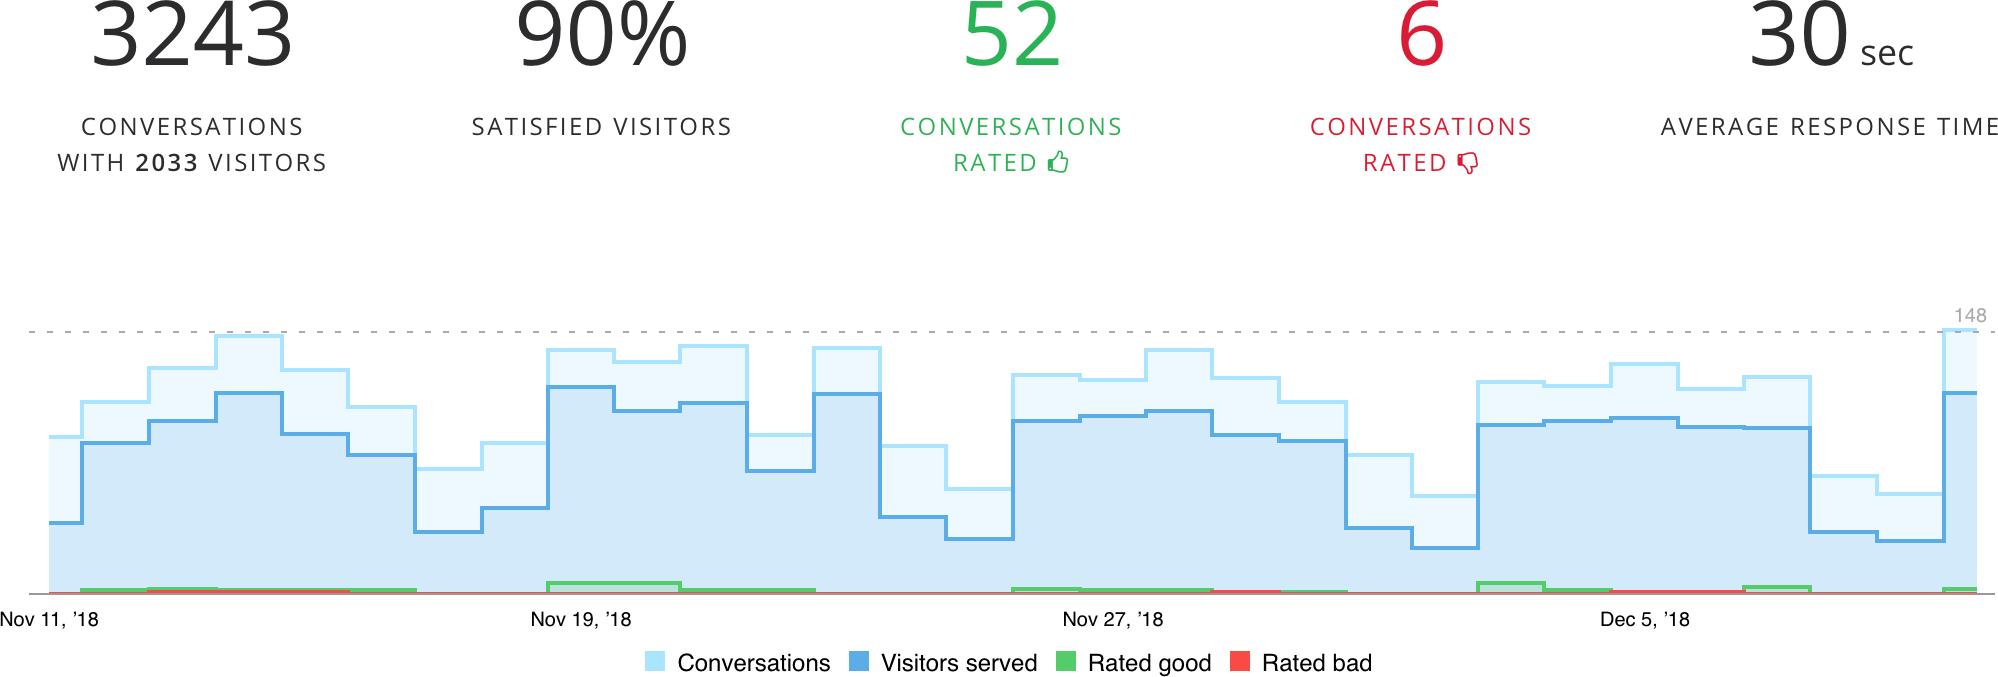 Chat and helpdesk customer traffic analytics